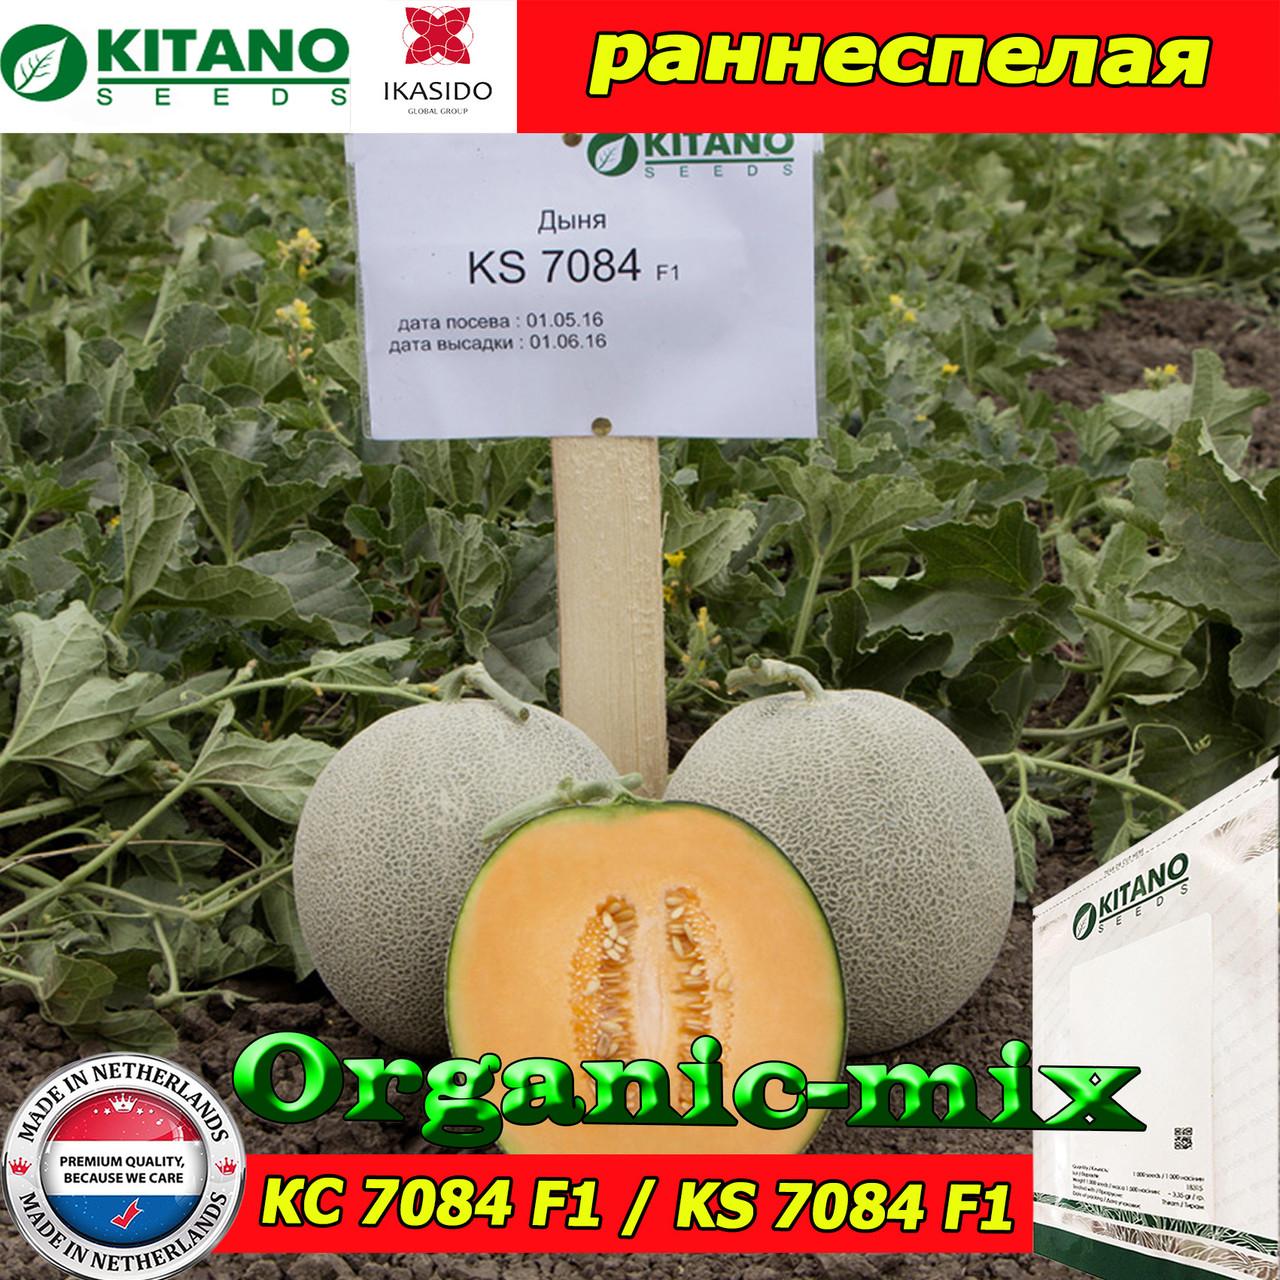 Дыня КС 7084 F1 / KS 7084 (раннеспелая), 1000 семян ТМ Kitano Seeds (Нидерланды)